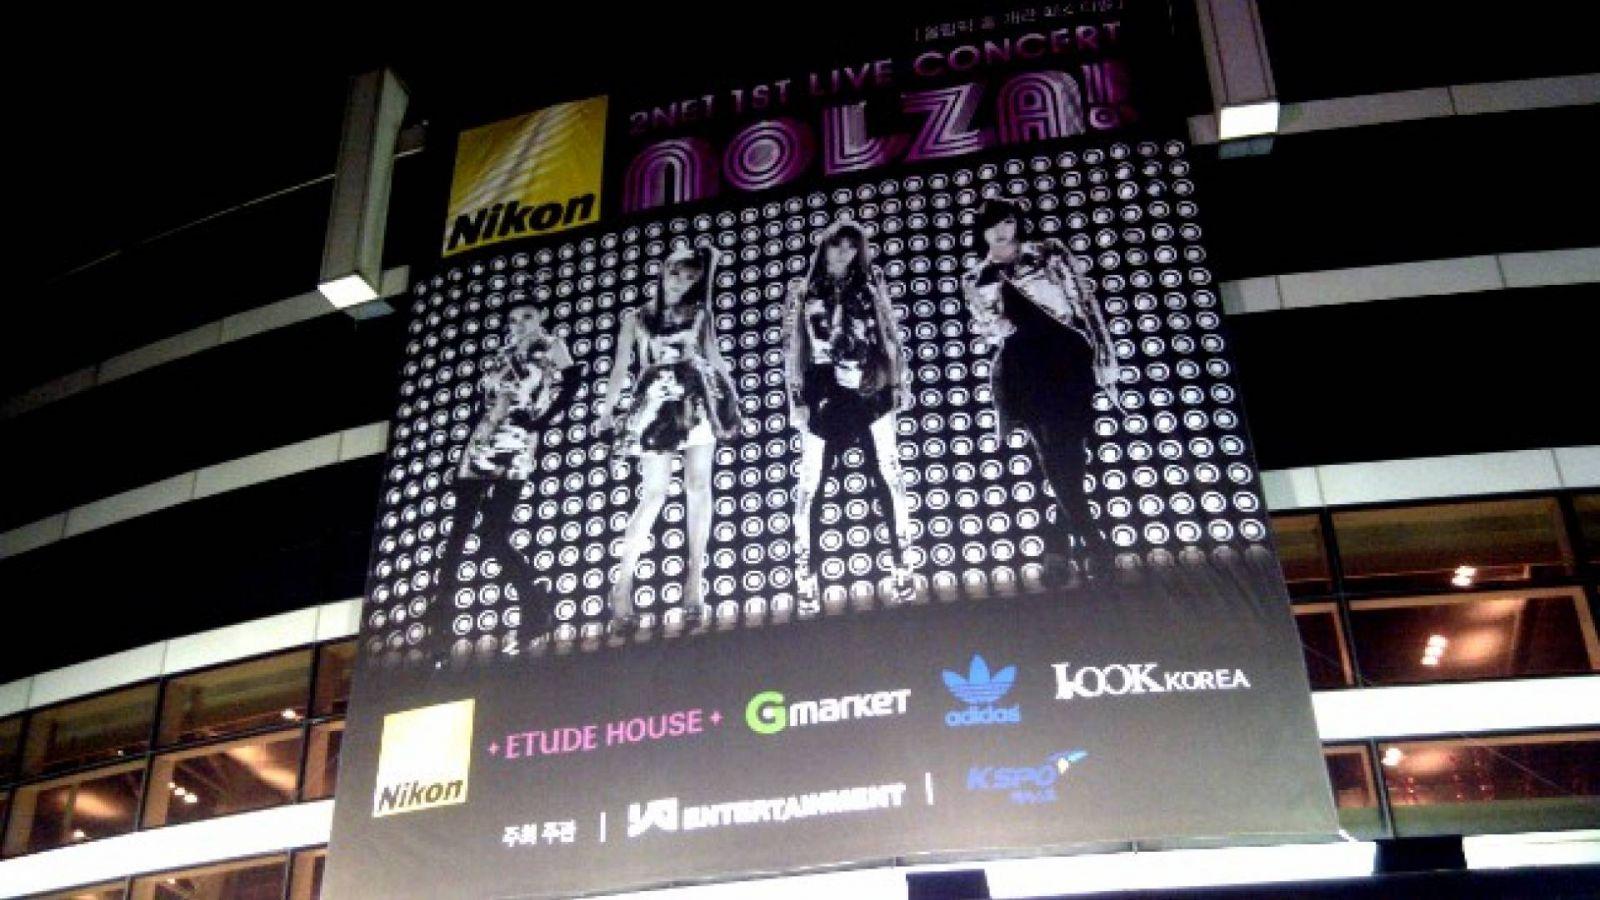 2NE1: First Live Concert NOLZA © KoME